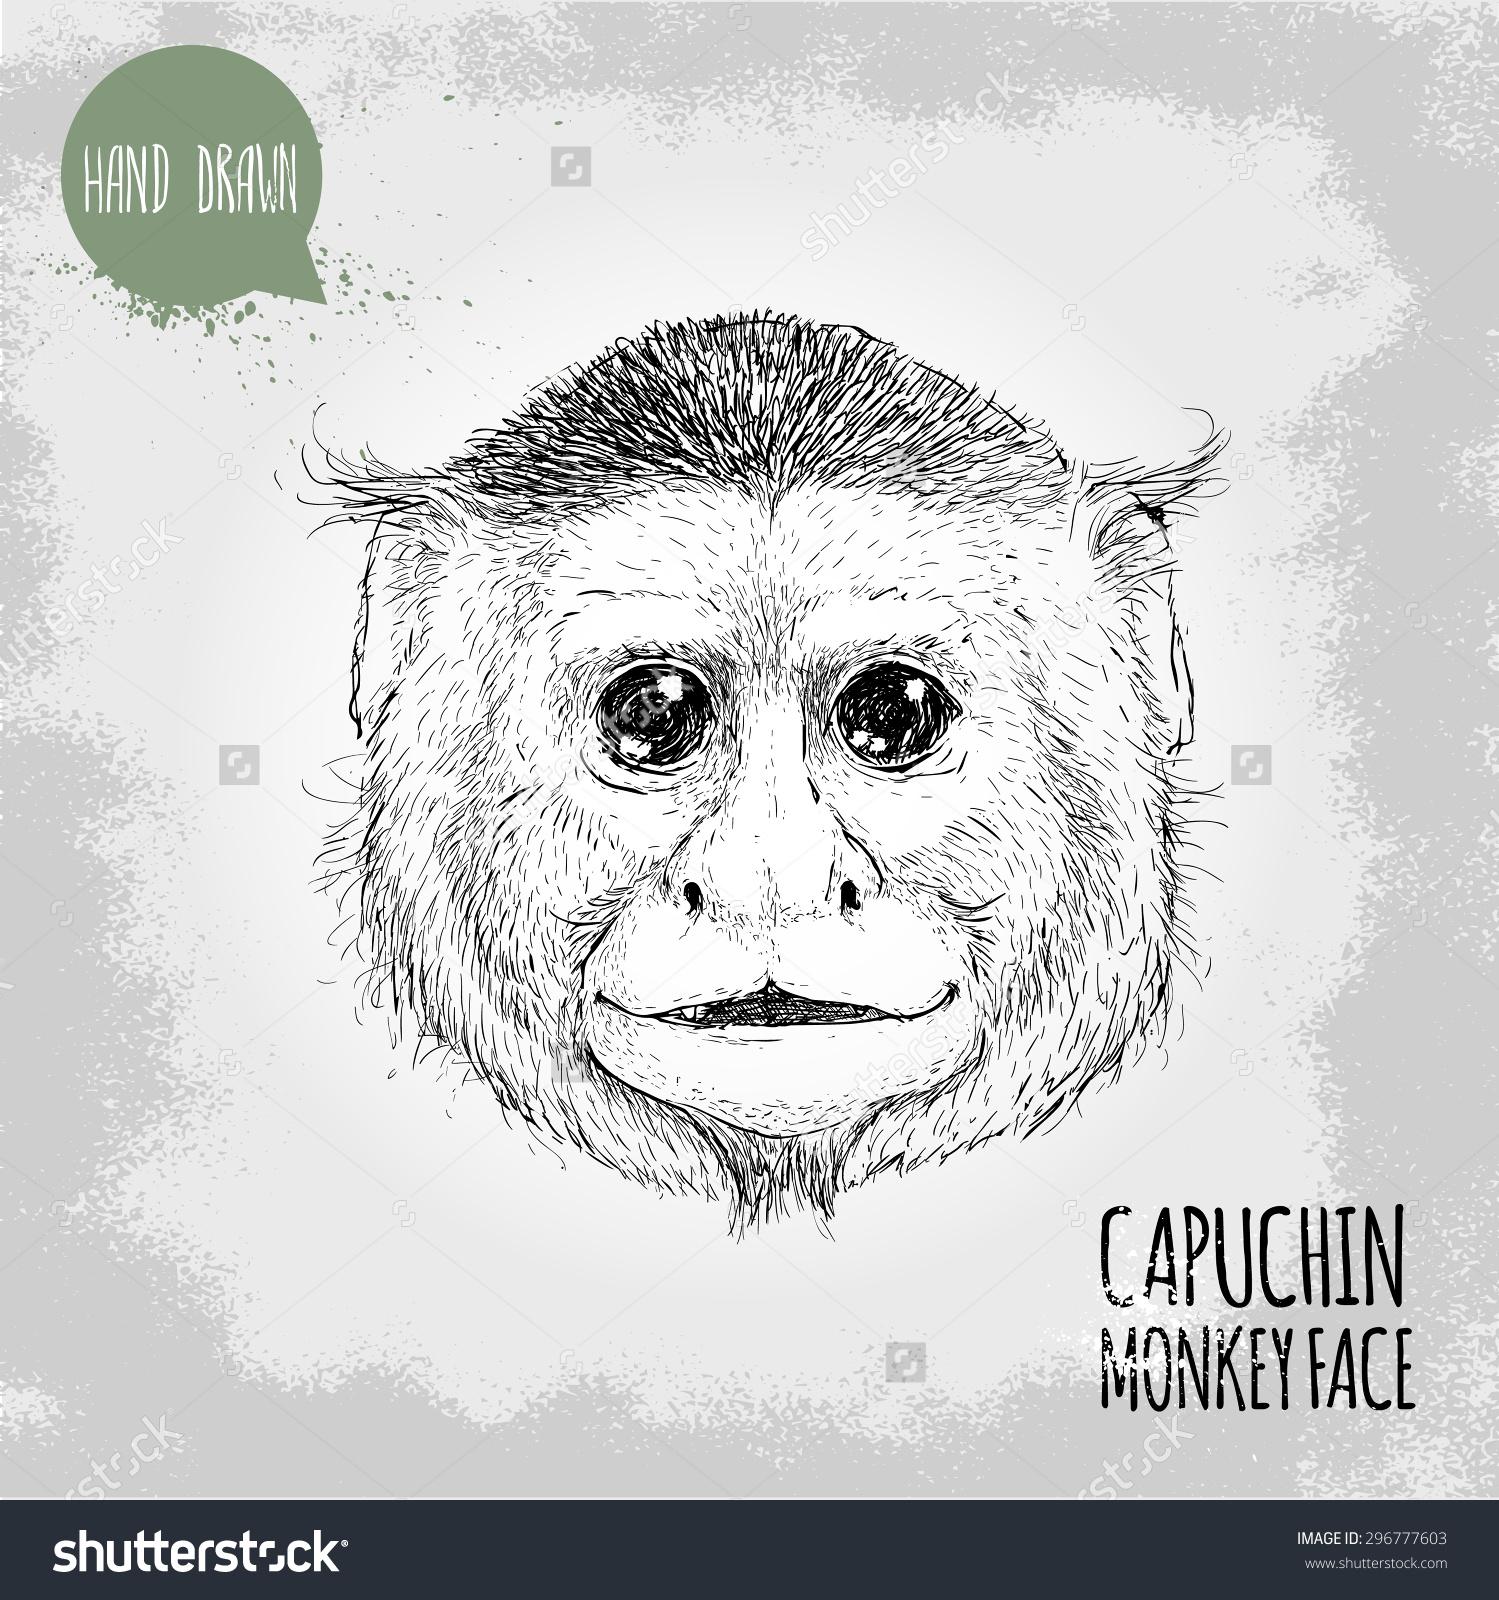 Hand Drawn Sketch Style Illustration Monkey Stock Vector 296777603.